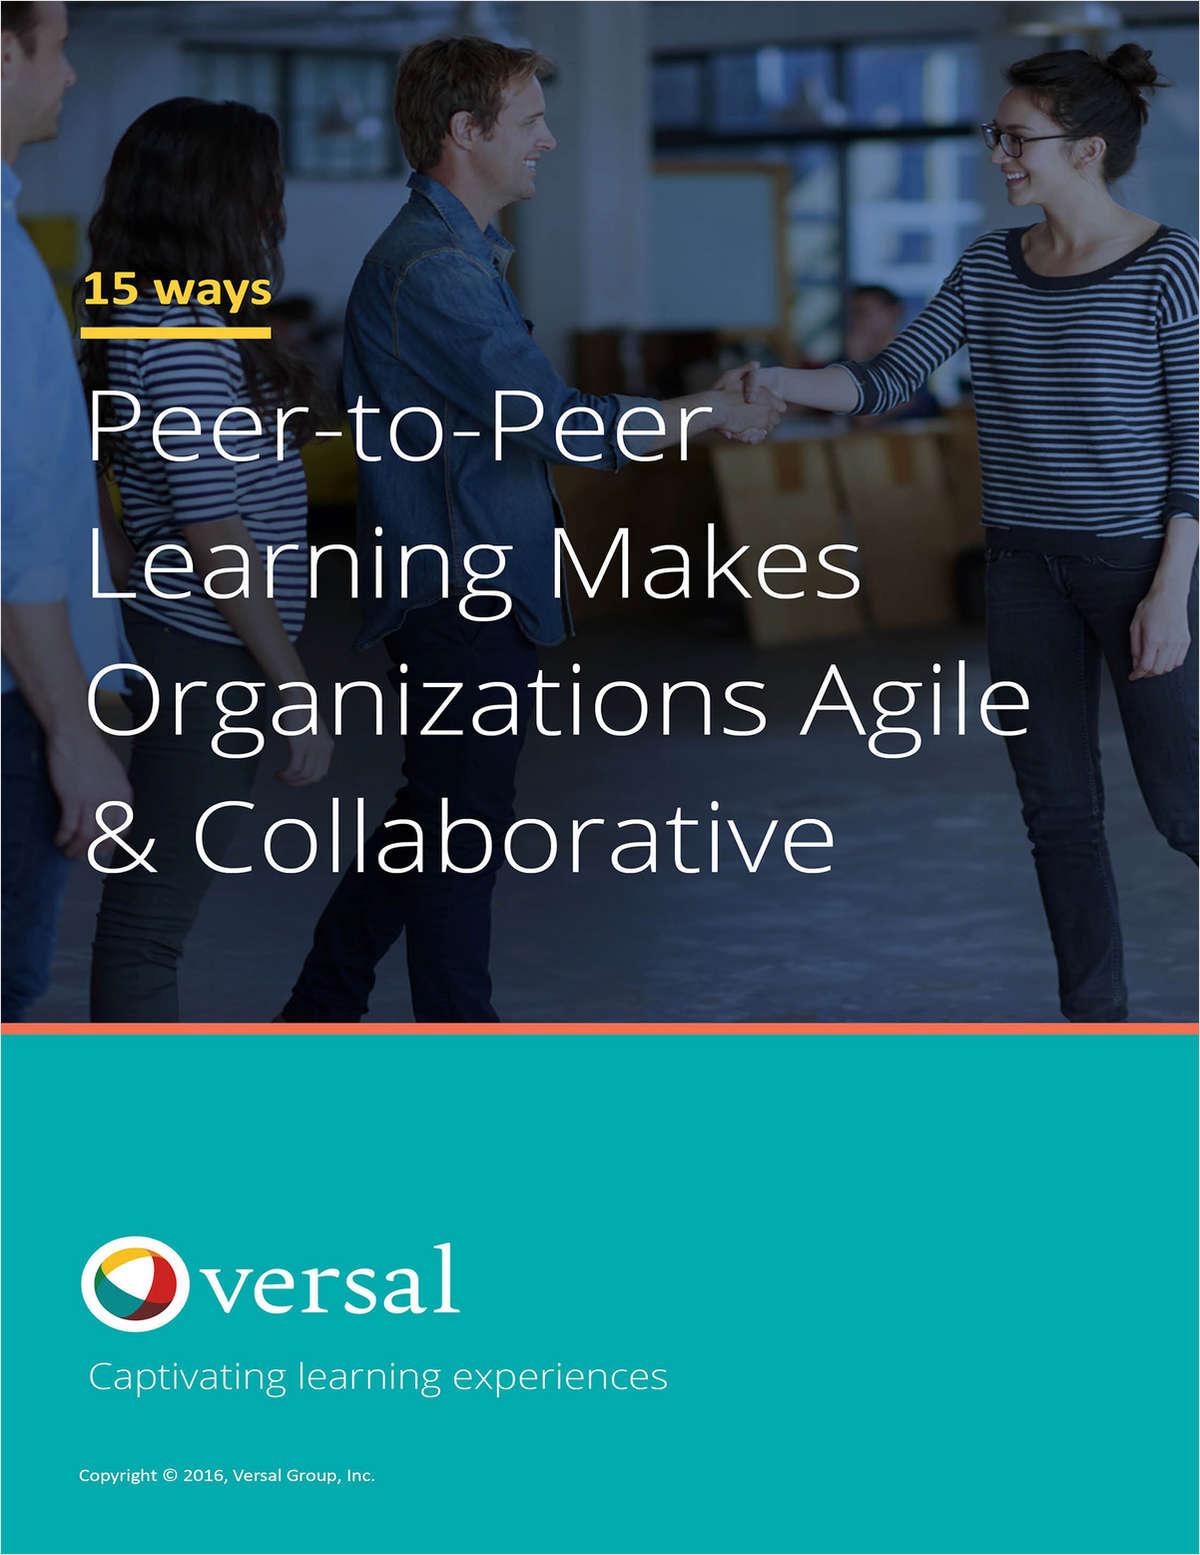 Peer-to-Peer Learning Makes Organizations Agile & Collaborative